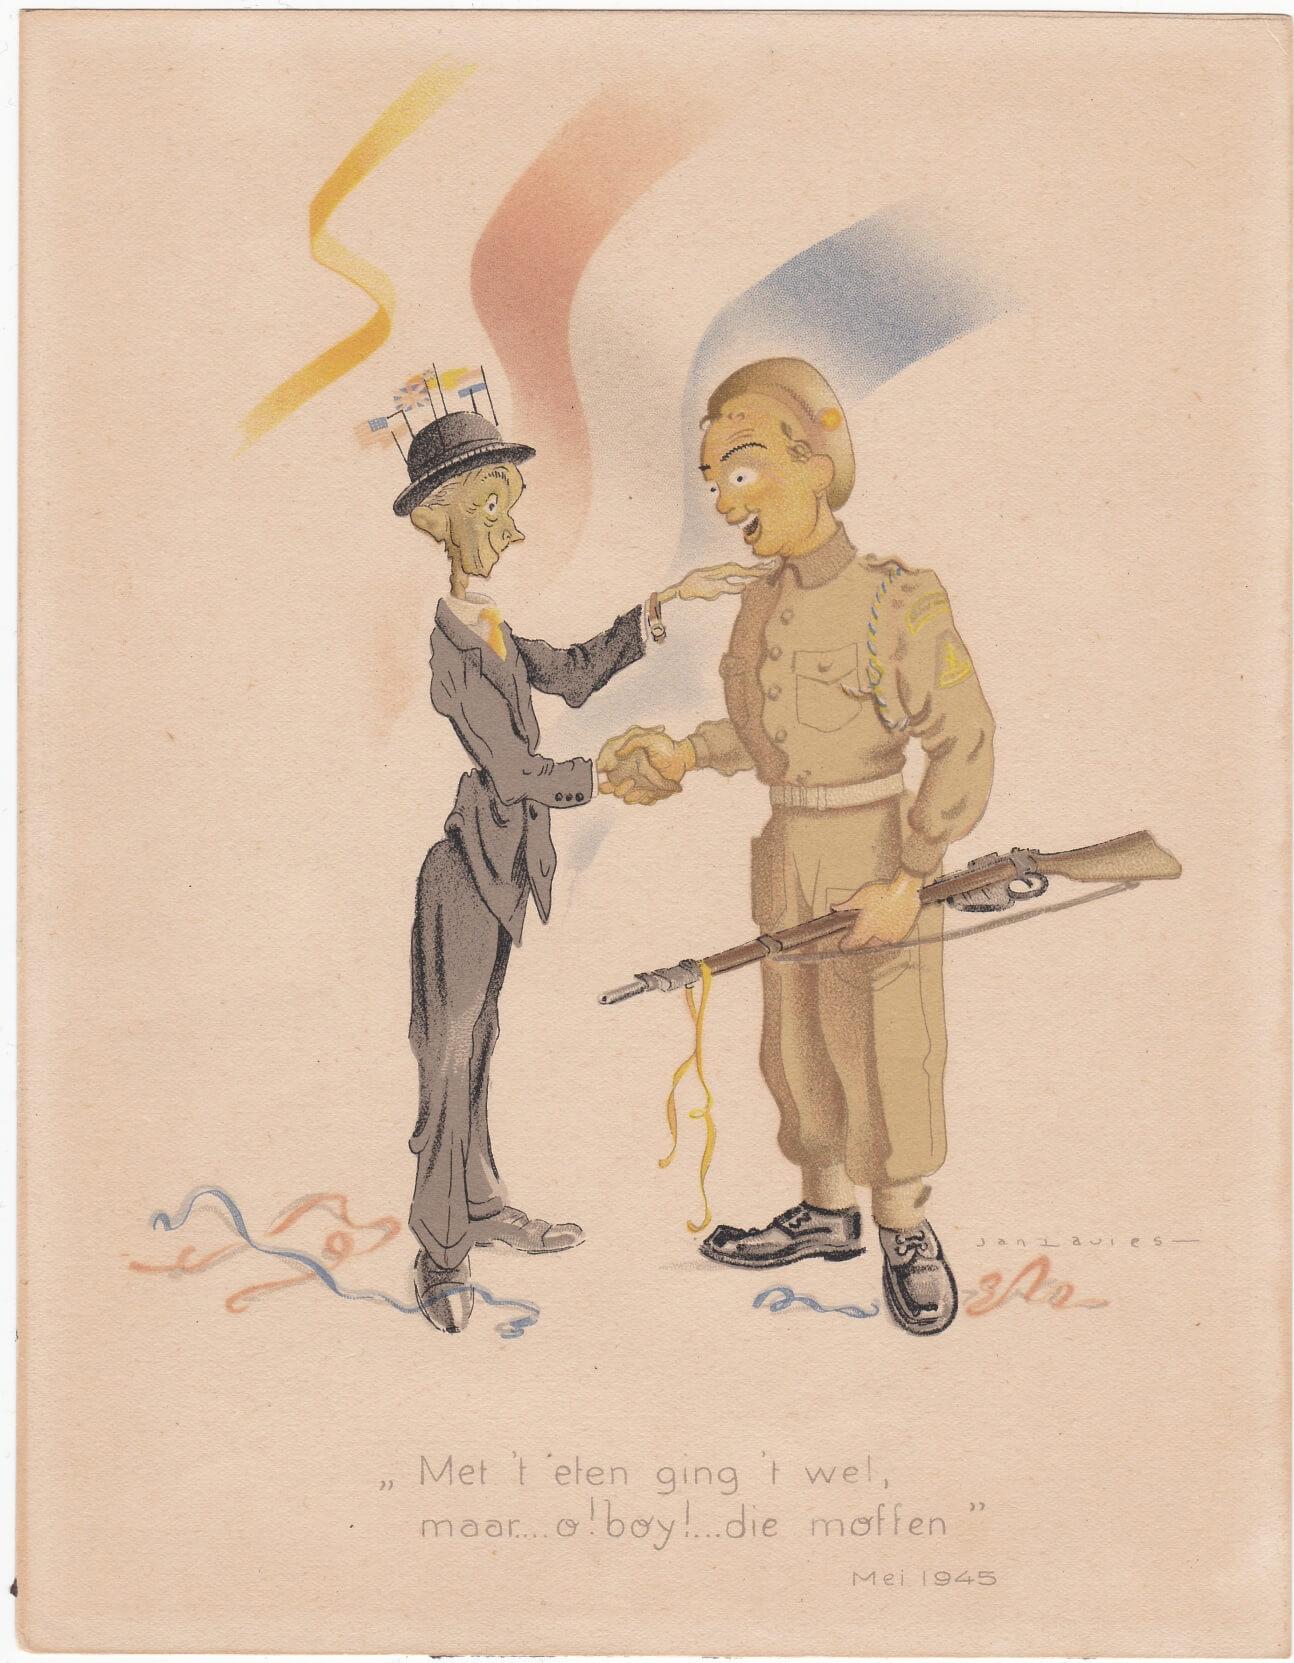 Spotprent hongerwinter bevrijding 1945